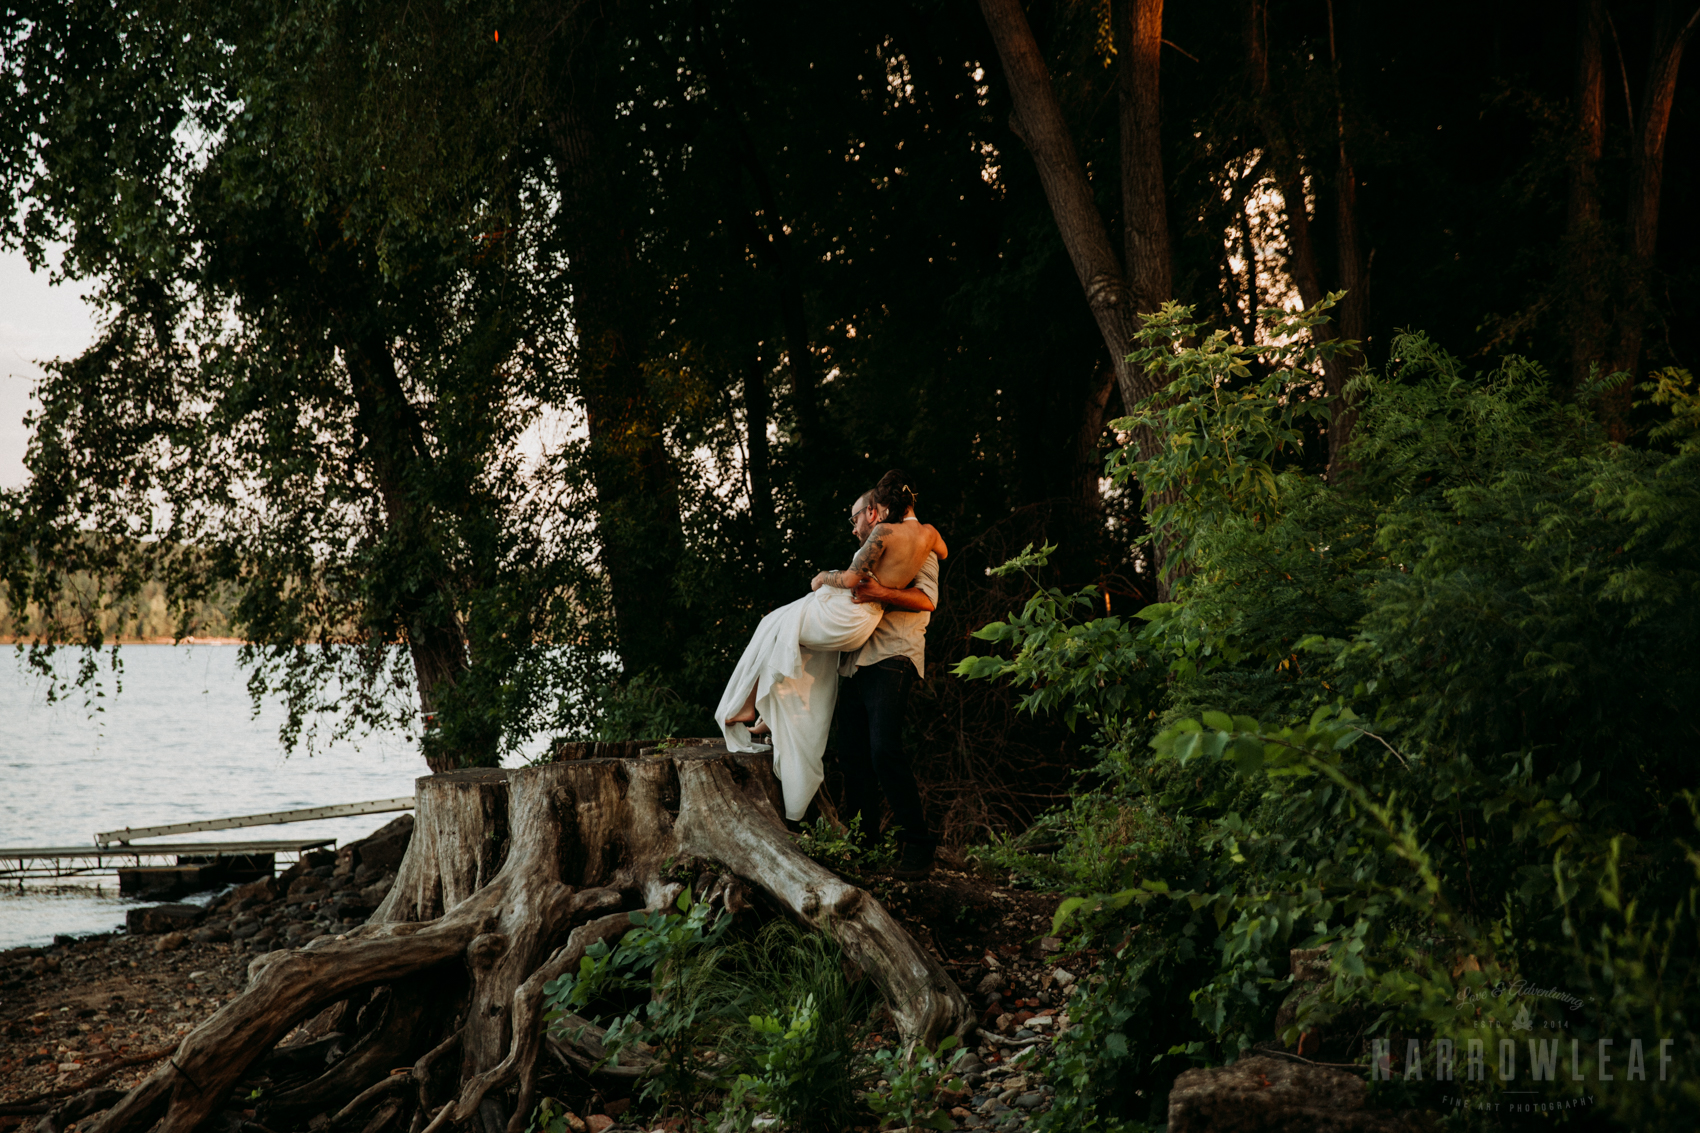 minnesota-outdoor-wedding-elopement-NarrowLeaf_Love_&_Adventure_Photography-21.jpg